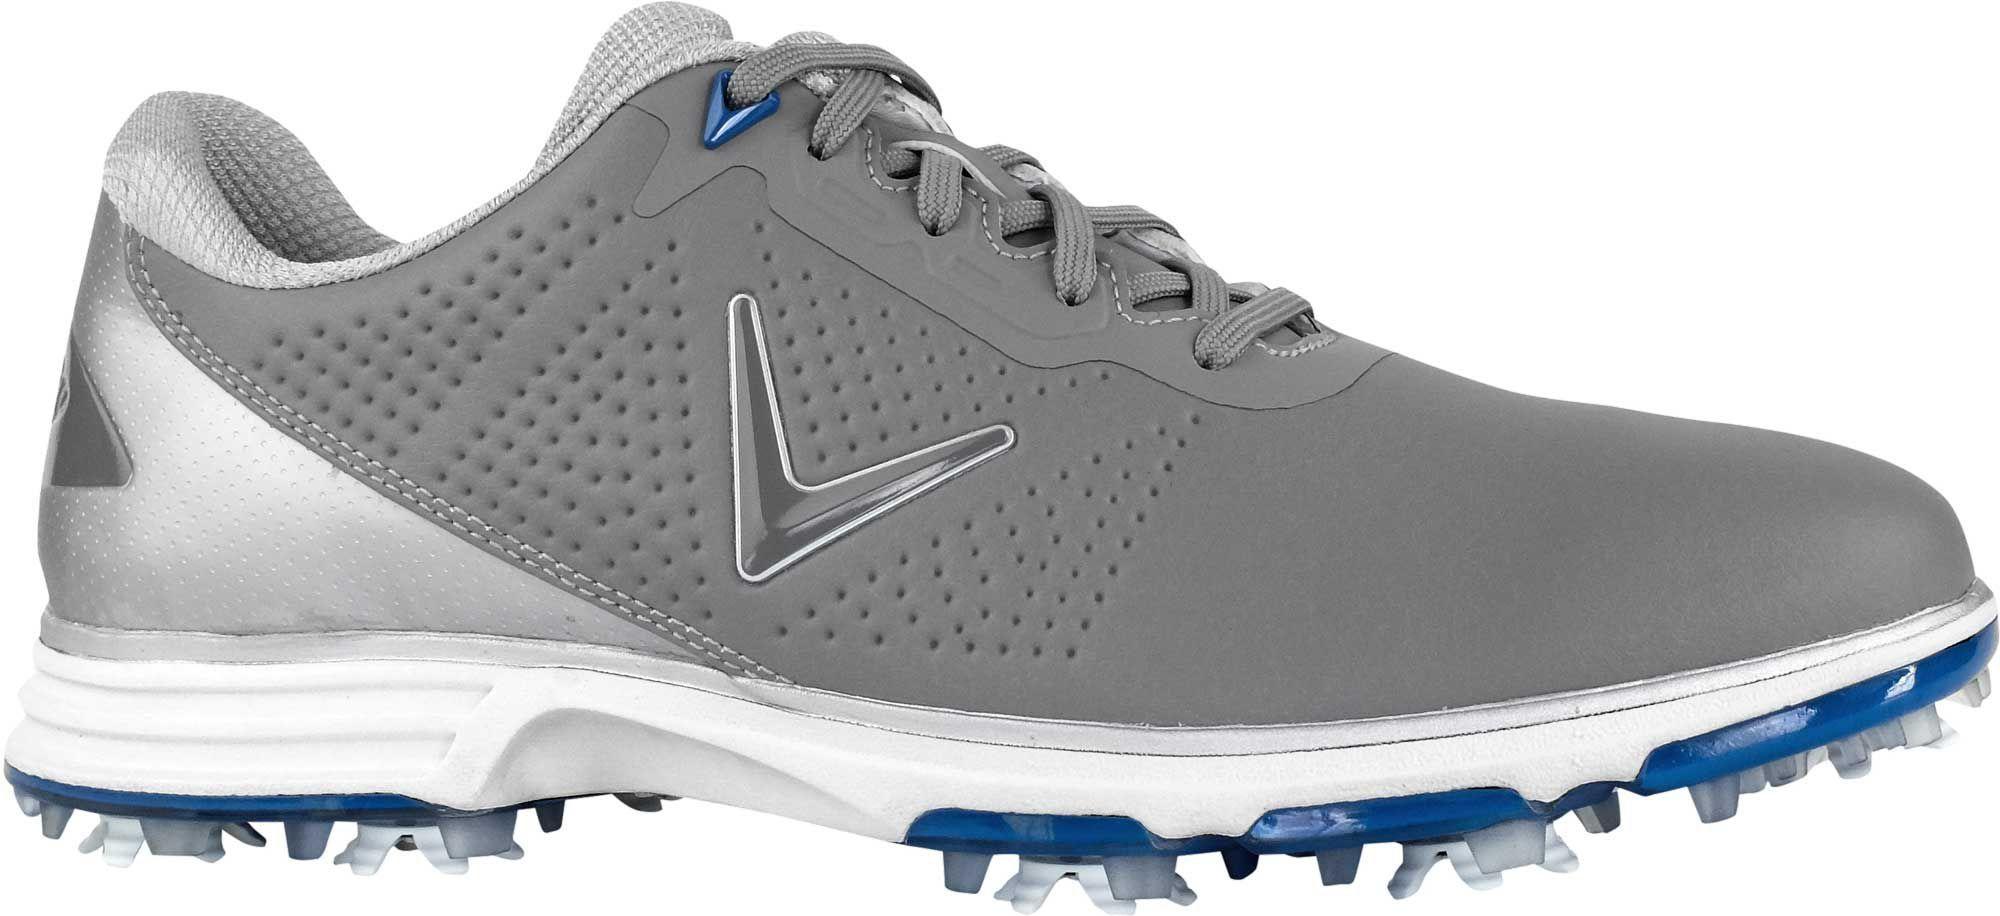 the best attitude 1b4e2 1f0e0 Callaway Coronado Golf Shoes, Mens, Size 13.0, Gray